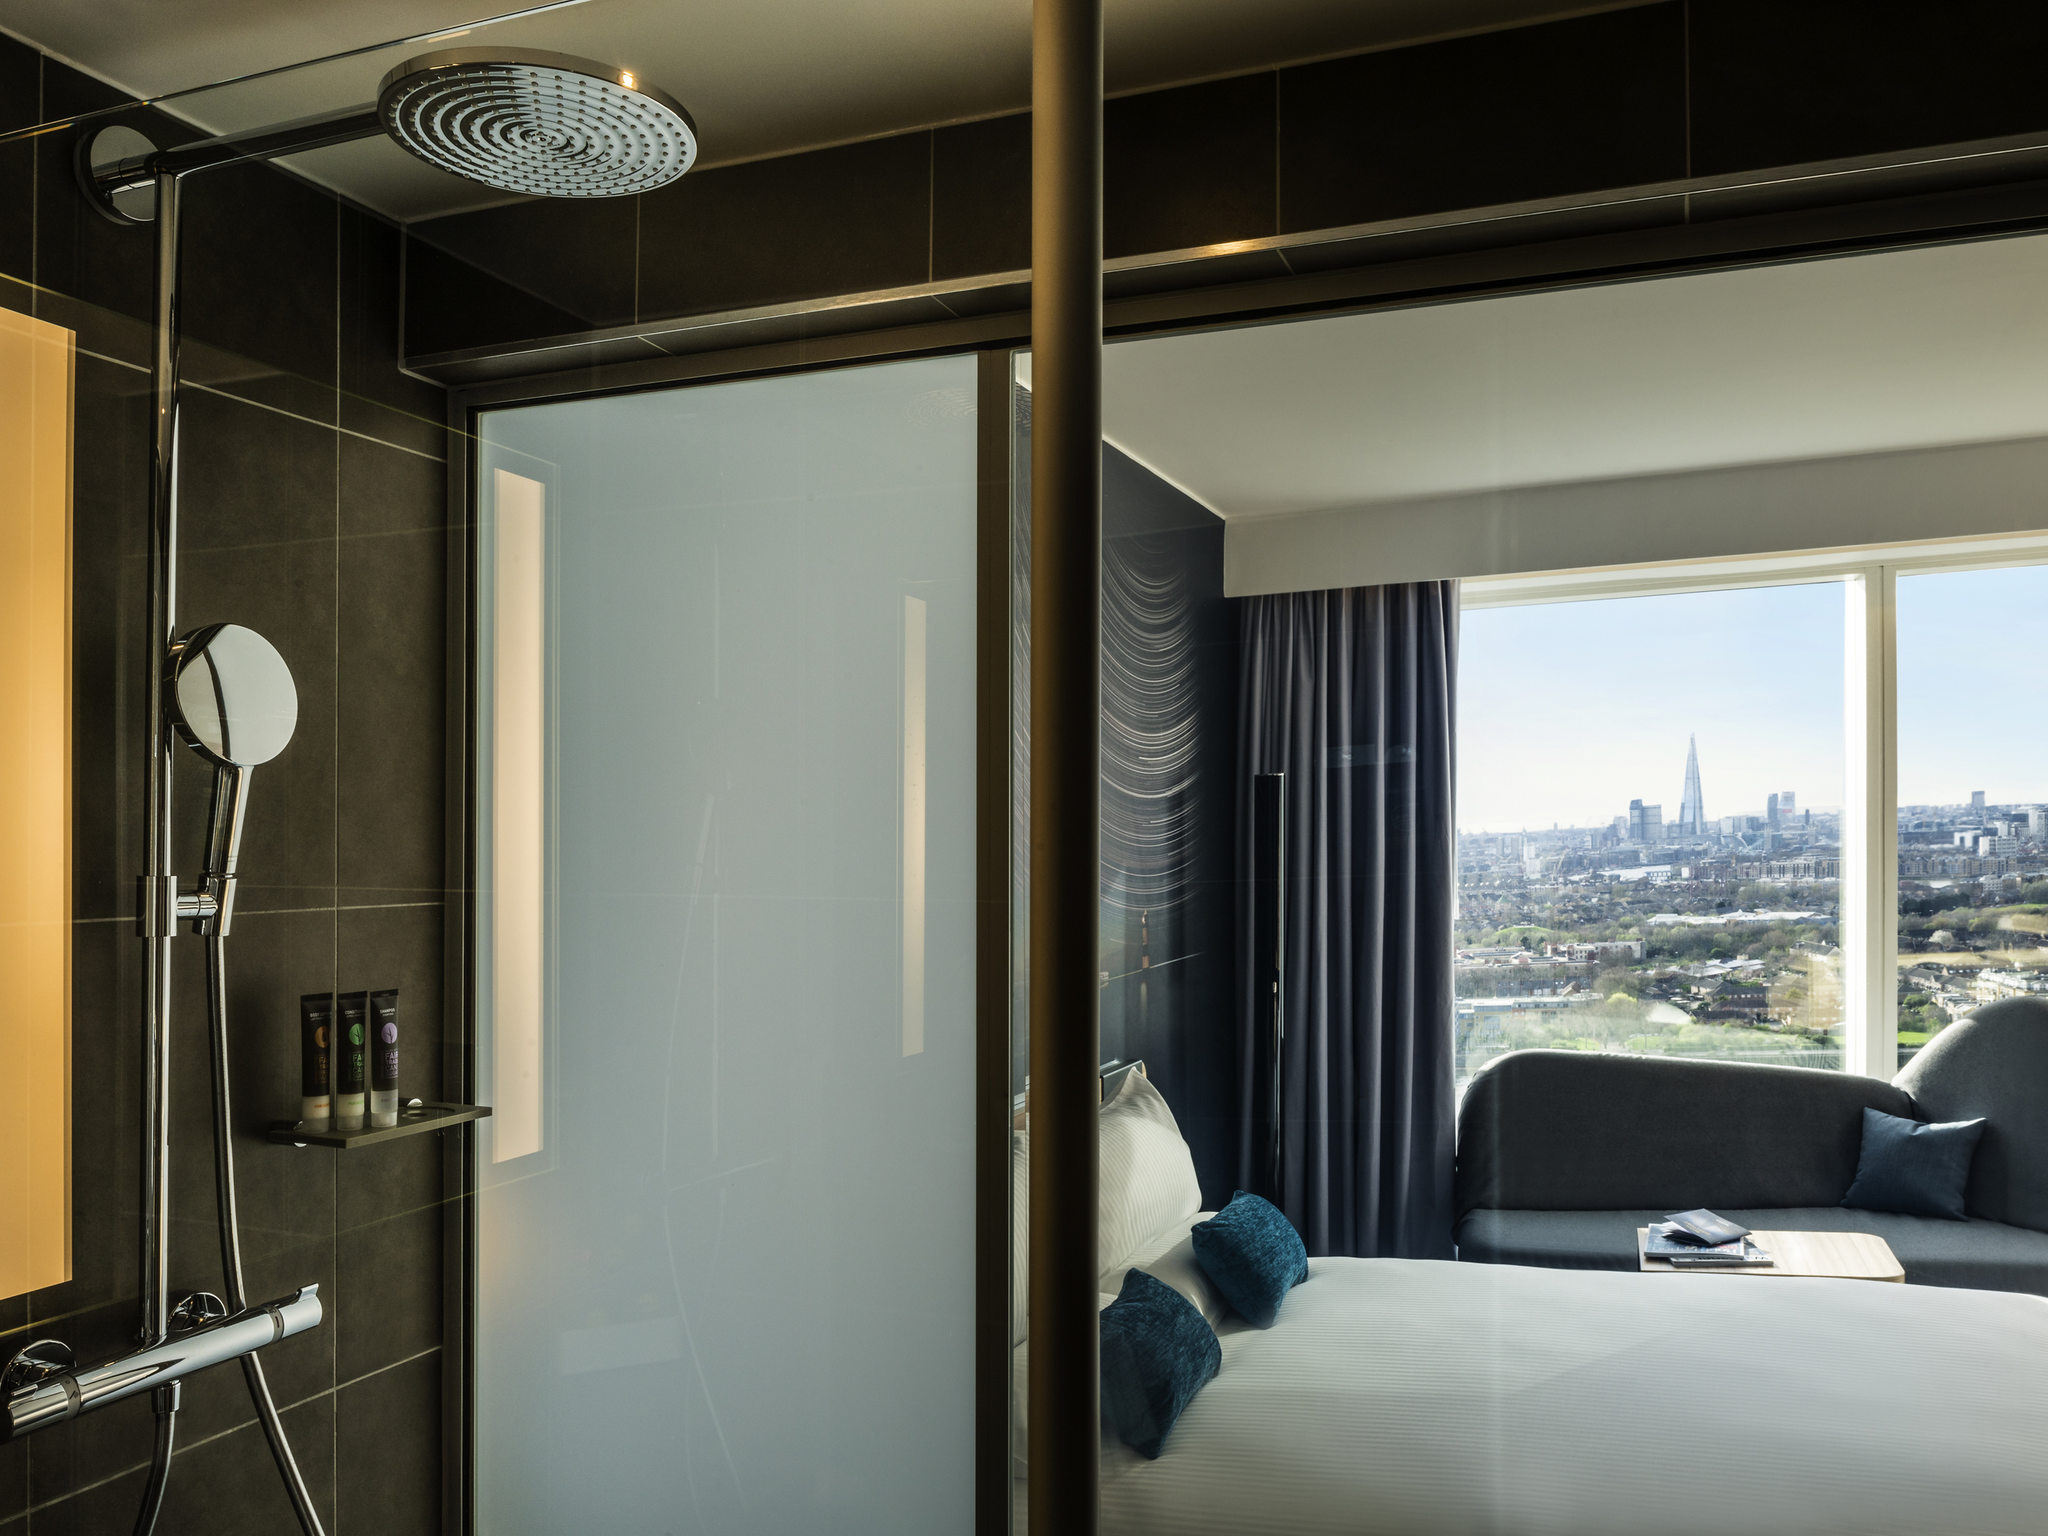 Hotel in LONDON - Novotel London Canary Wharf